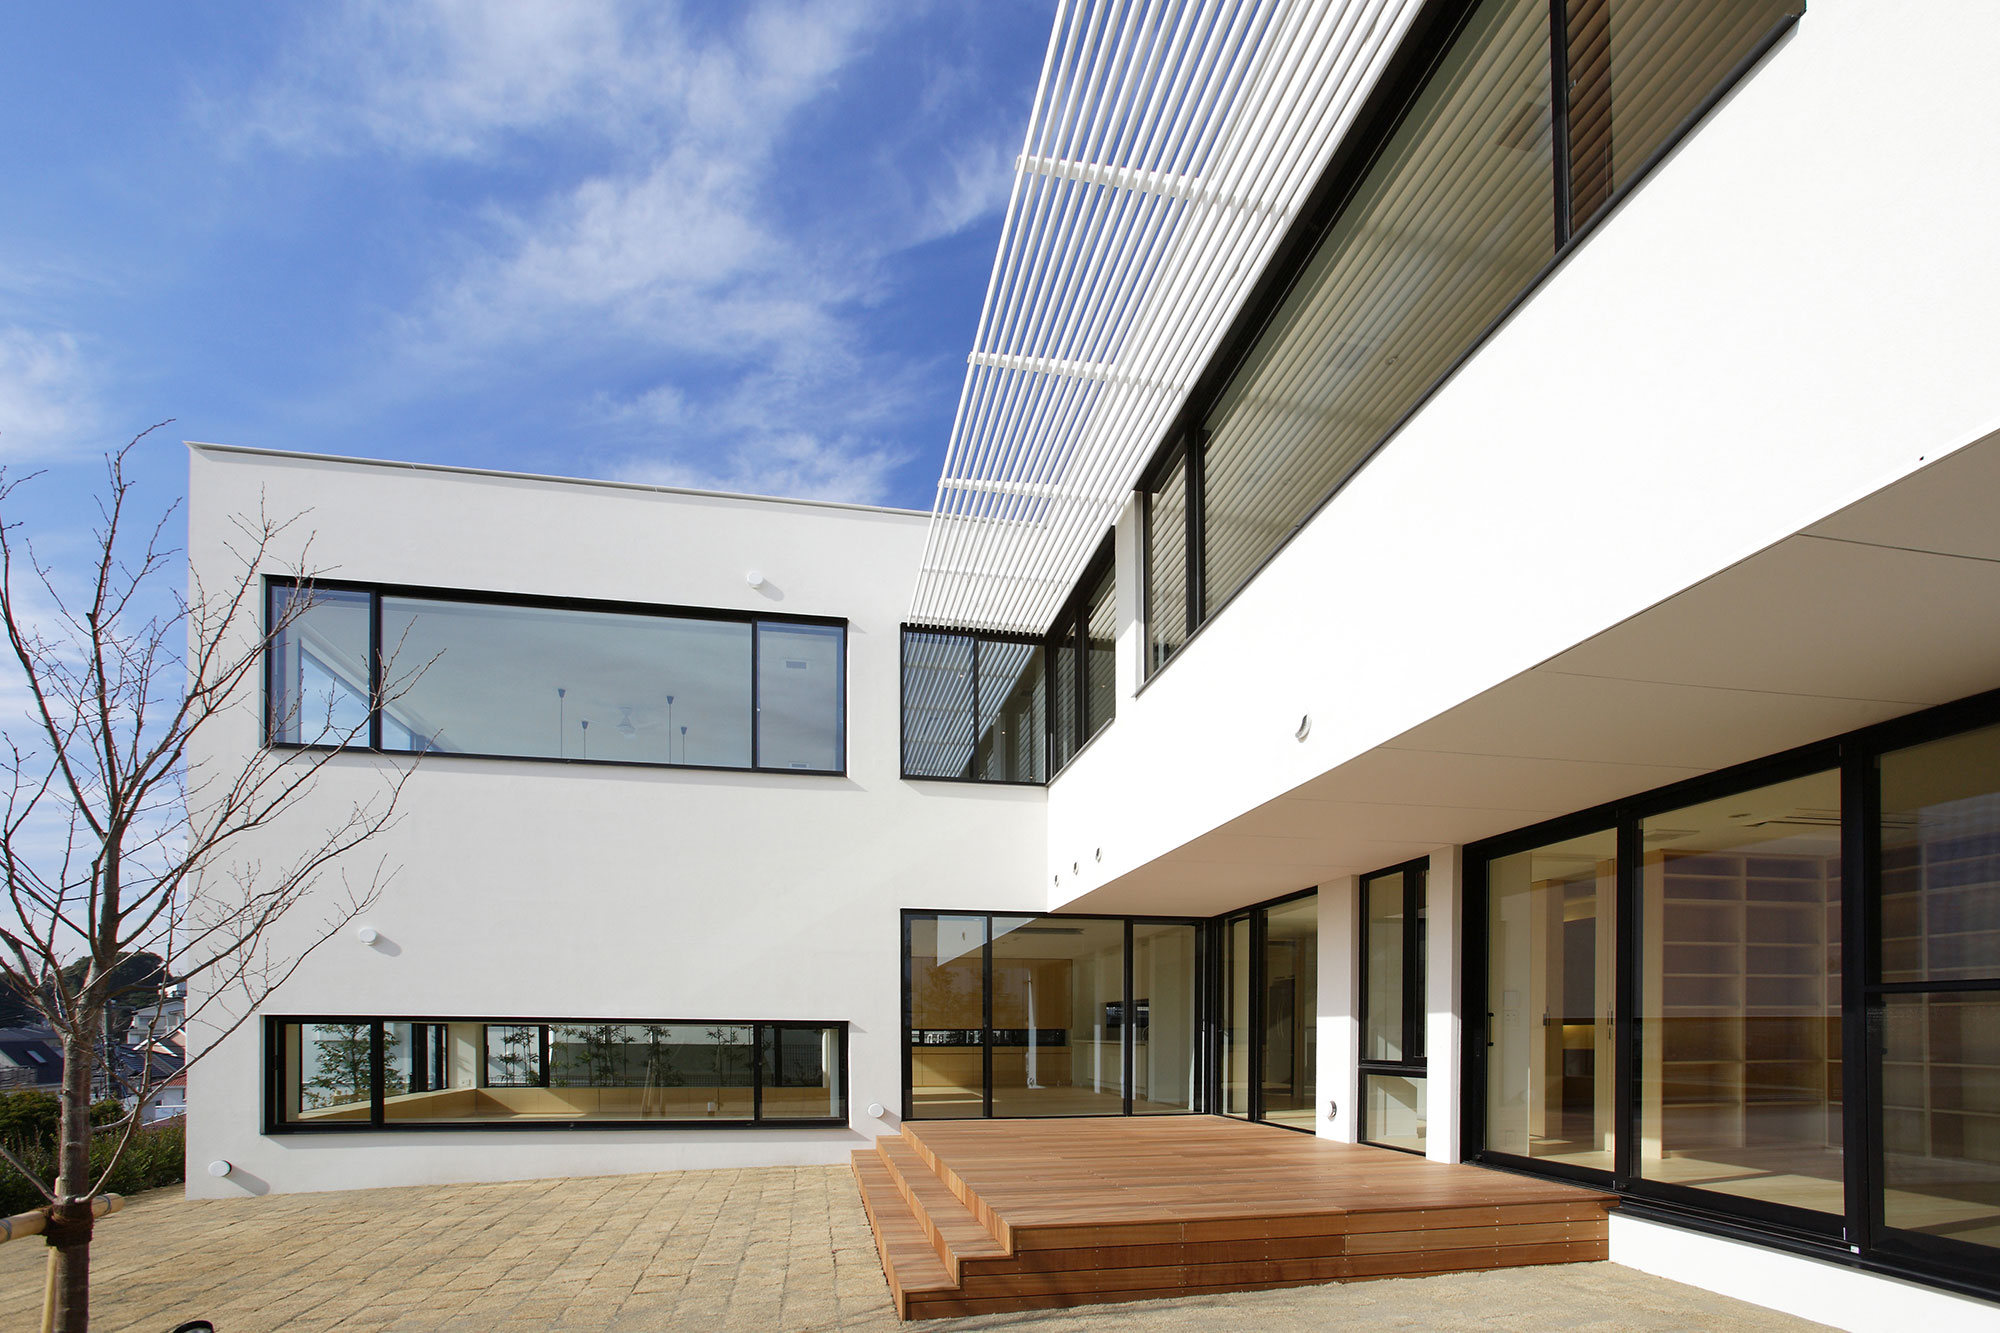 House on the Bluff by Edward Suzuki Associates (5)